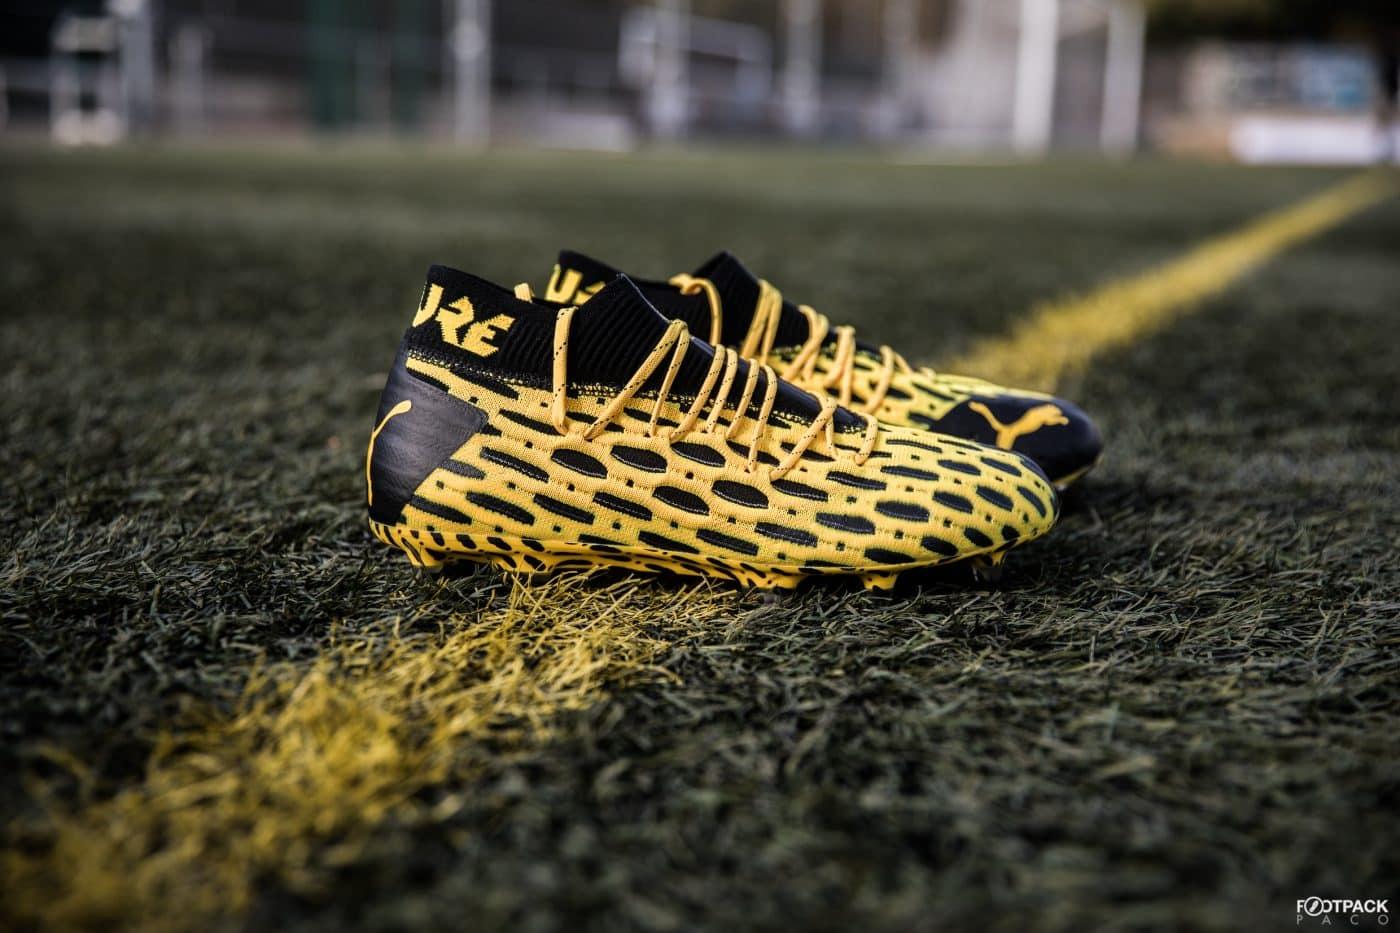 chaussures-de-foot-puma-future-5.1-spark-janvier-2020-footpack-3